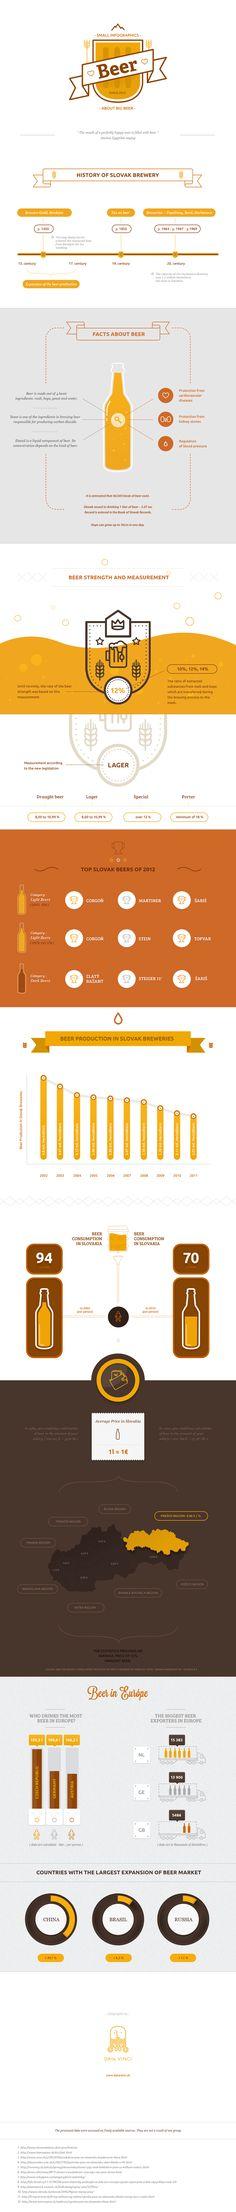 Infographics of Slovak Beer